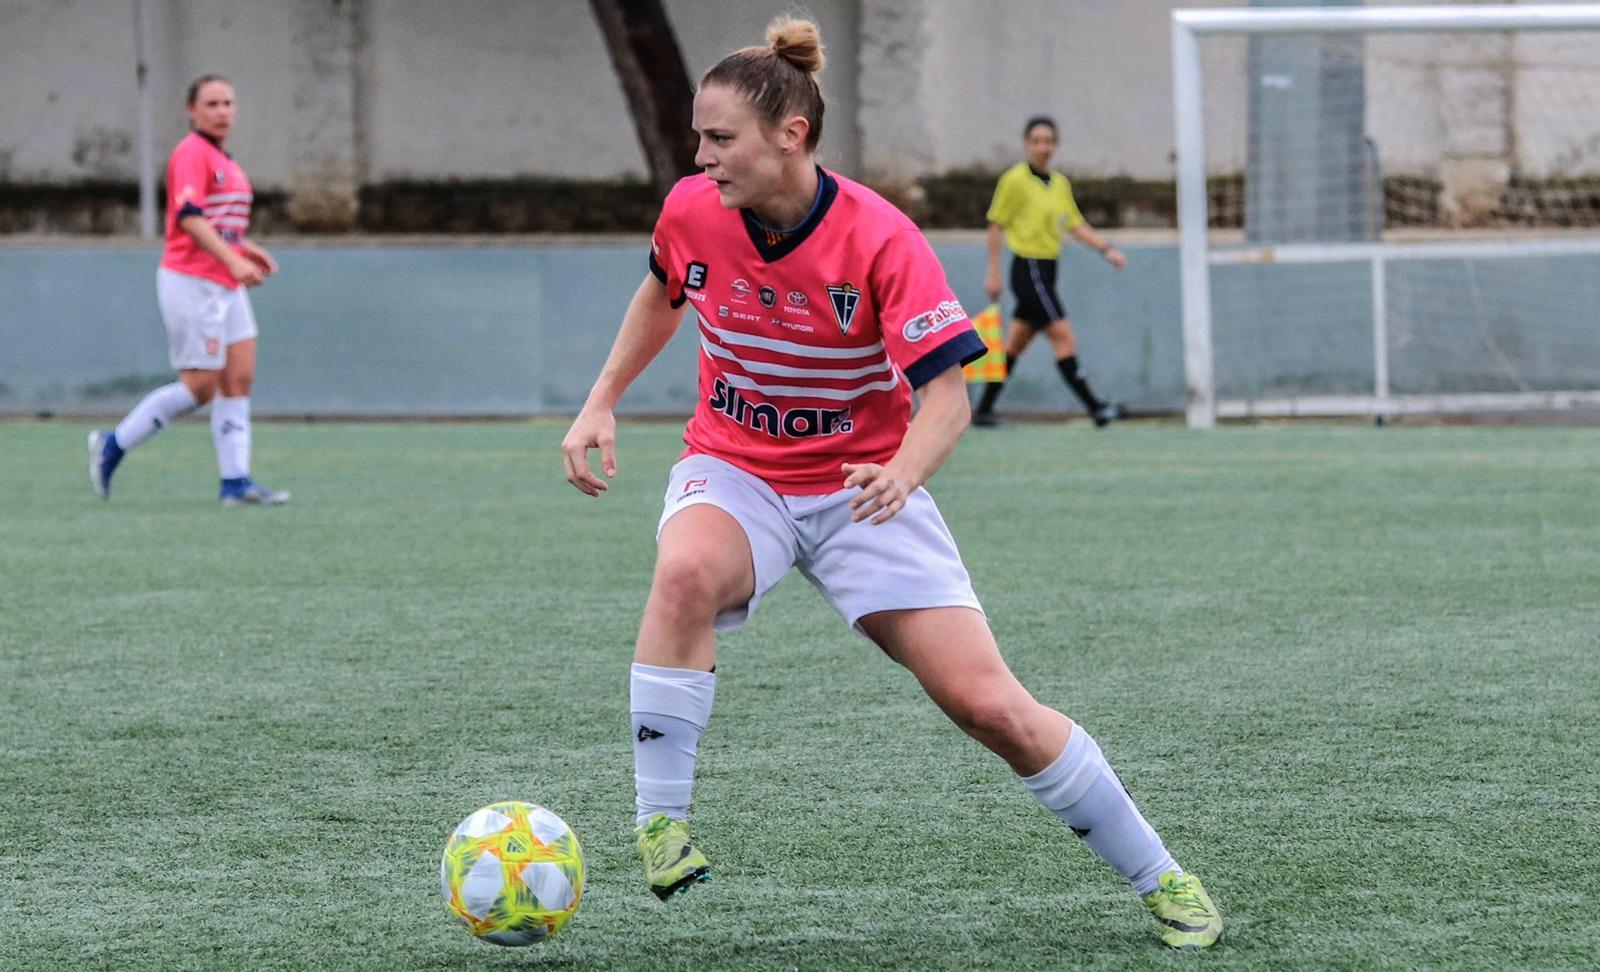 BALEARS FC 2-2 CF IGUALADA